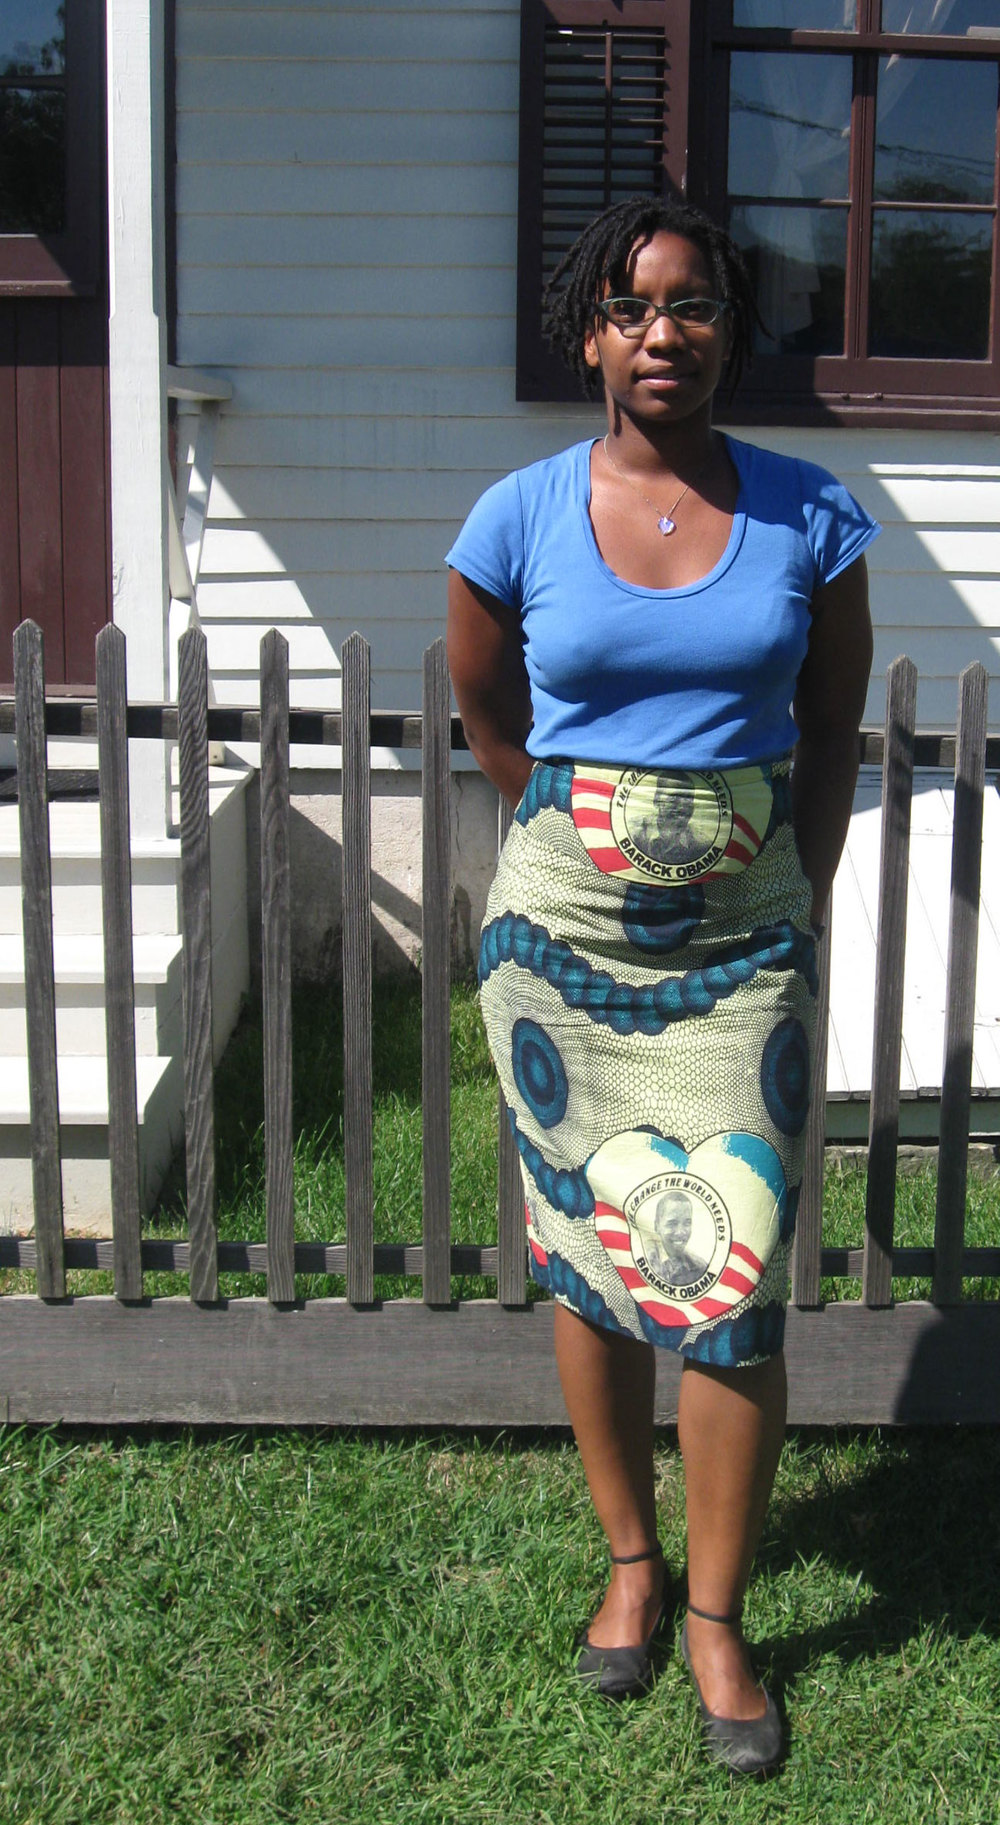 Aisha-Cousins_Story-Skirters_Jennifer-2014-09-14-F.jpg